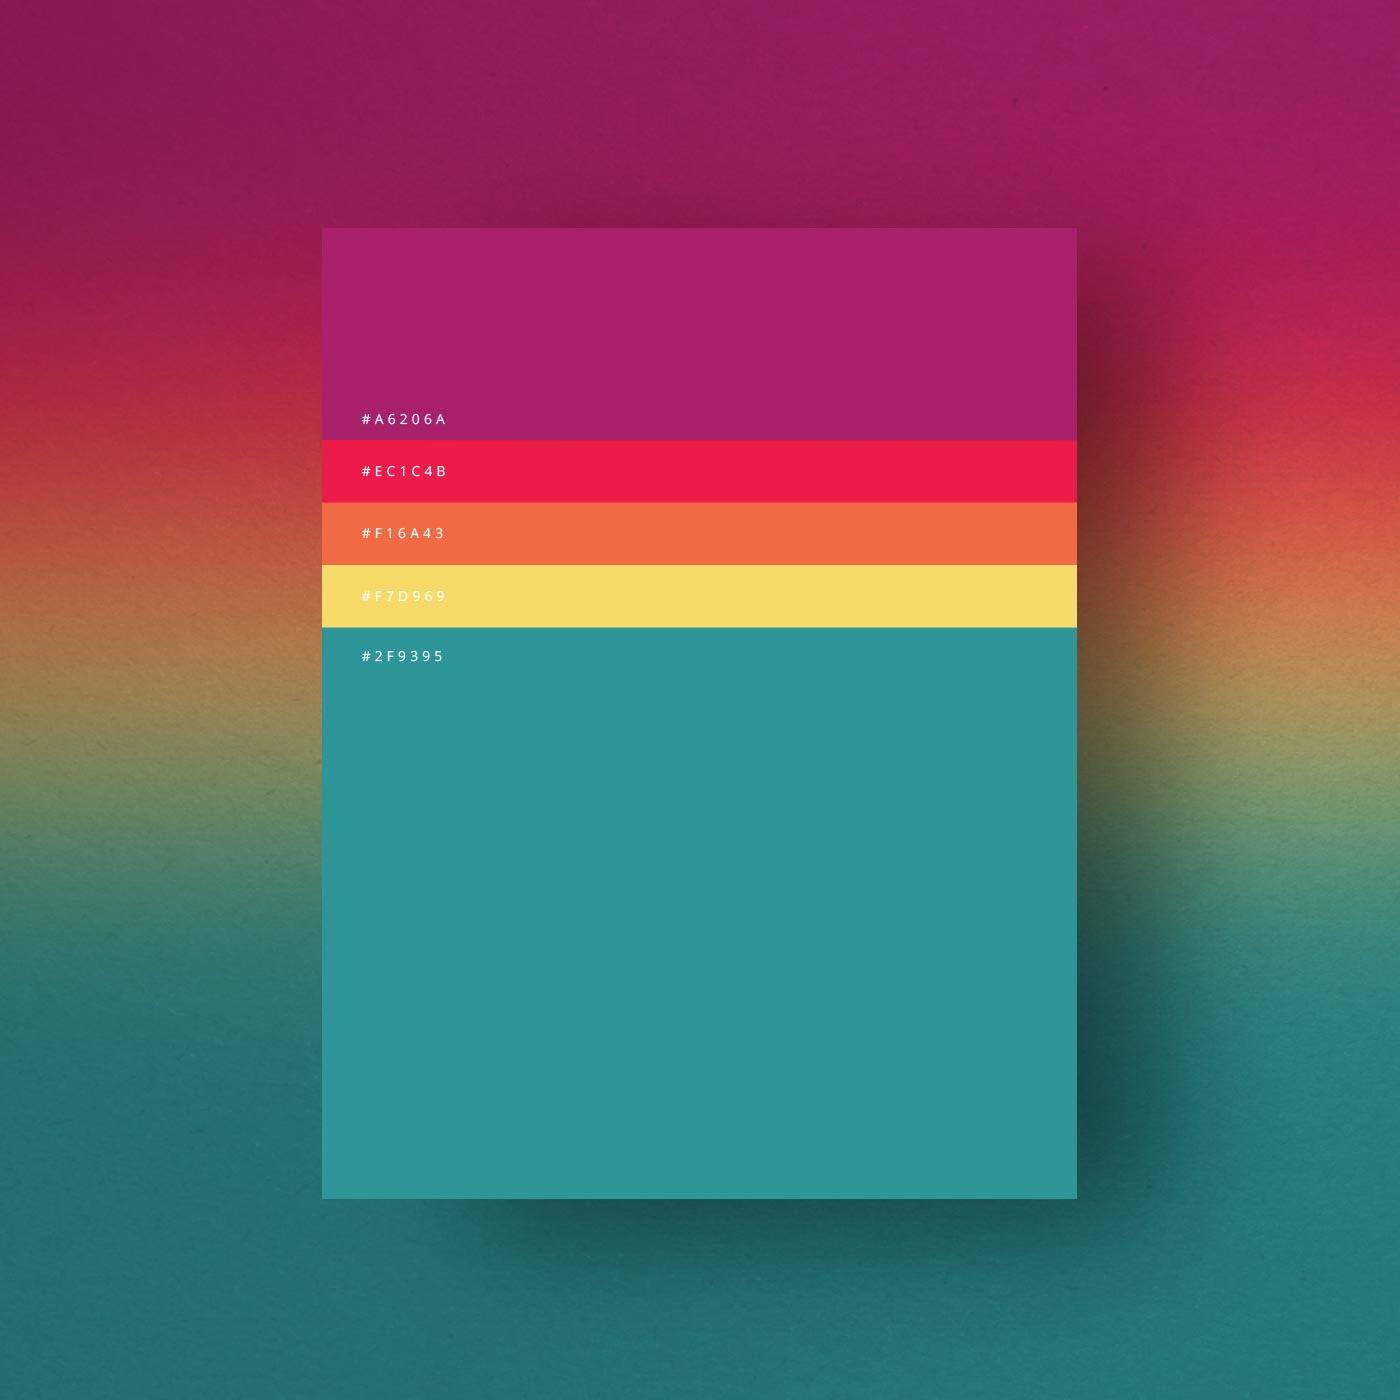 Minimalist Color Palettes Of 2015 Ttlg Design